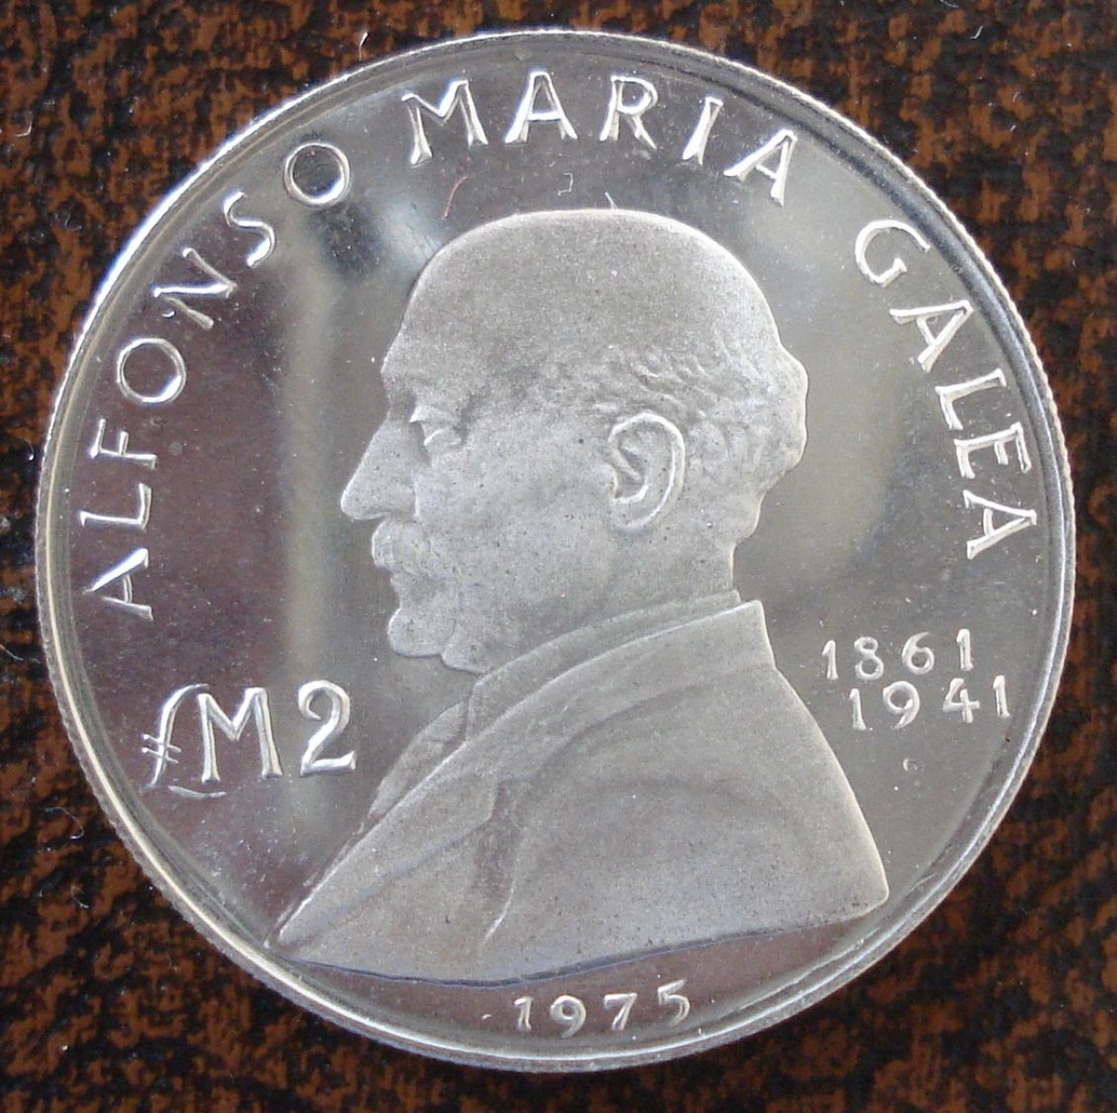 (J) MALTA: Silver 2 Pounds 1975 BUNC (2525)  GREAT!!!! - Malte